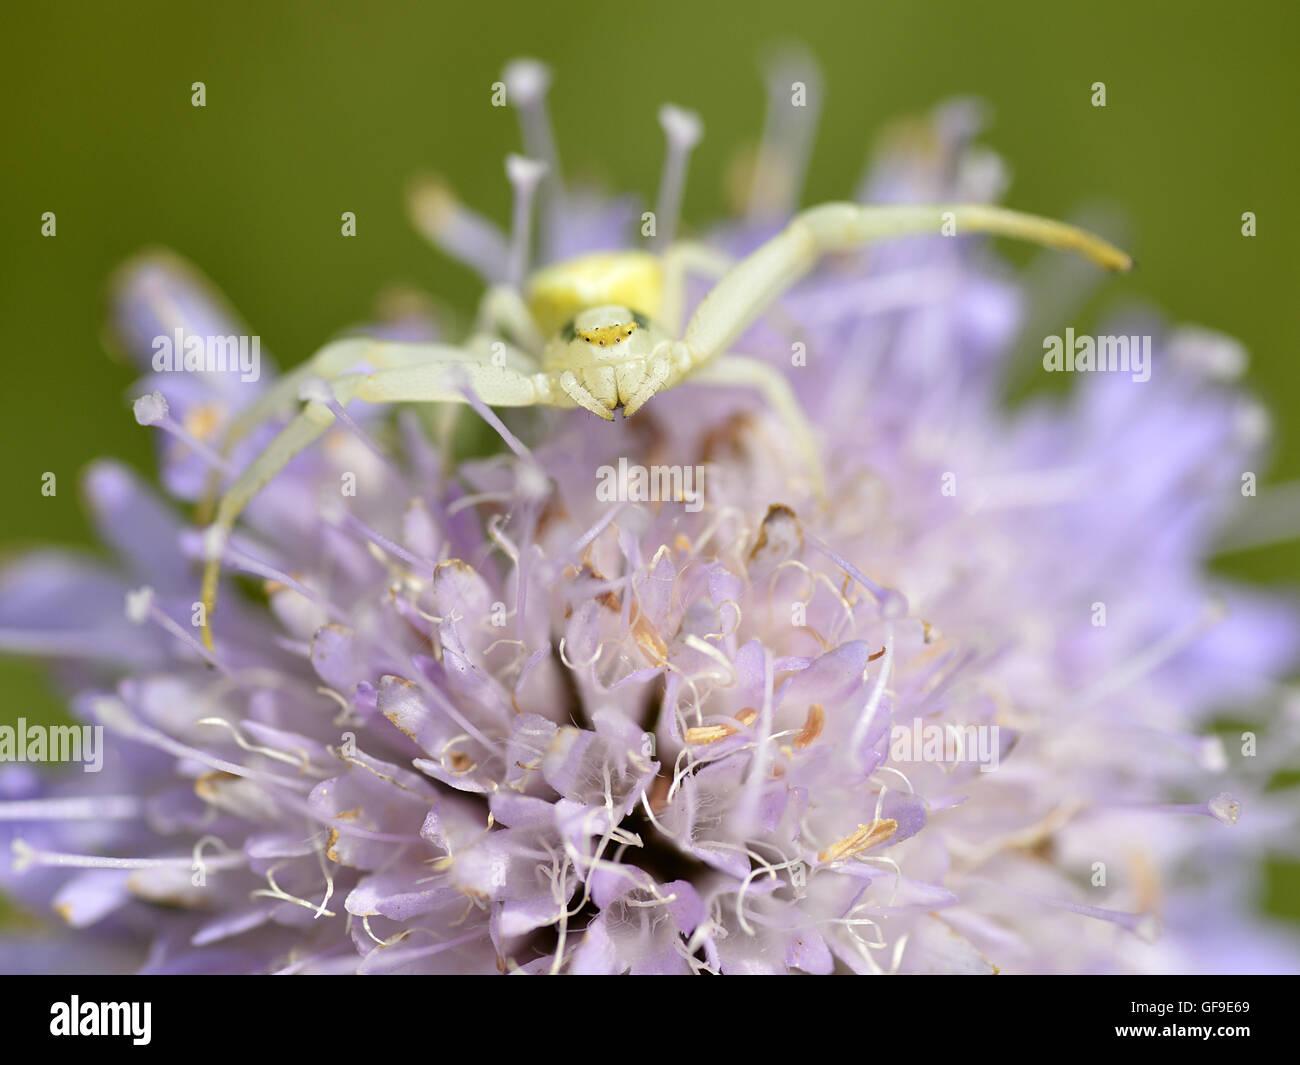 Macro d'araignée crabe (Misumena vatia) sur knautia fleur vu de l'avant Banque D'Images